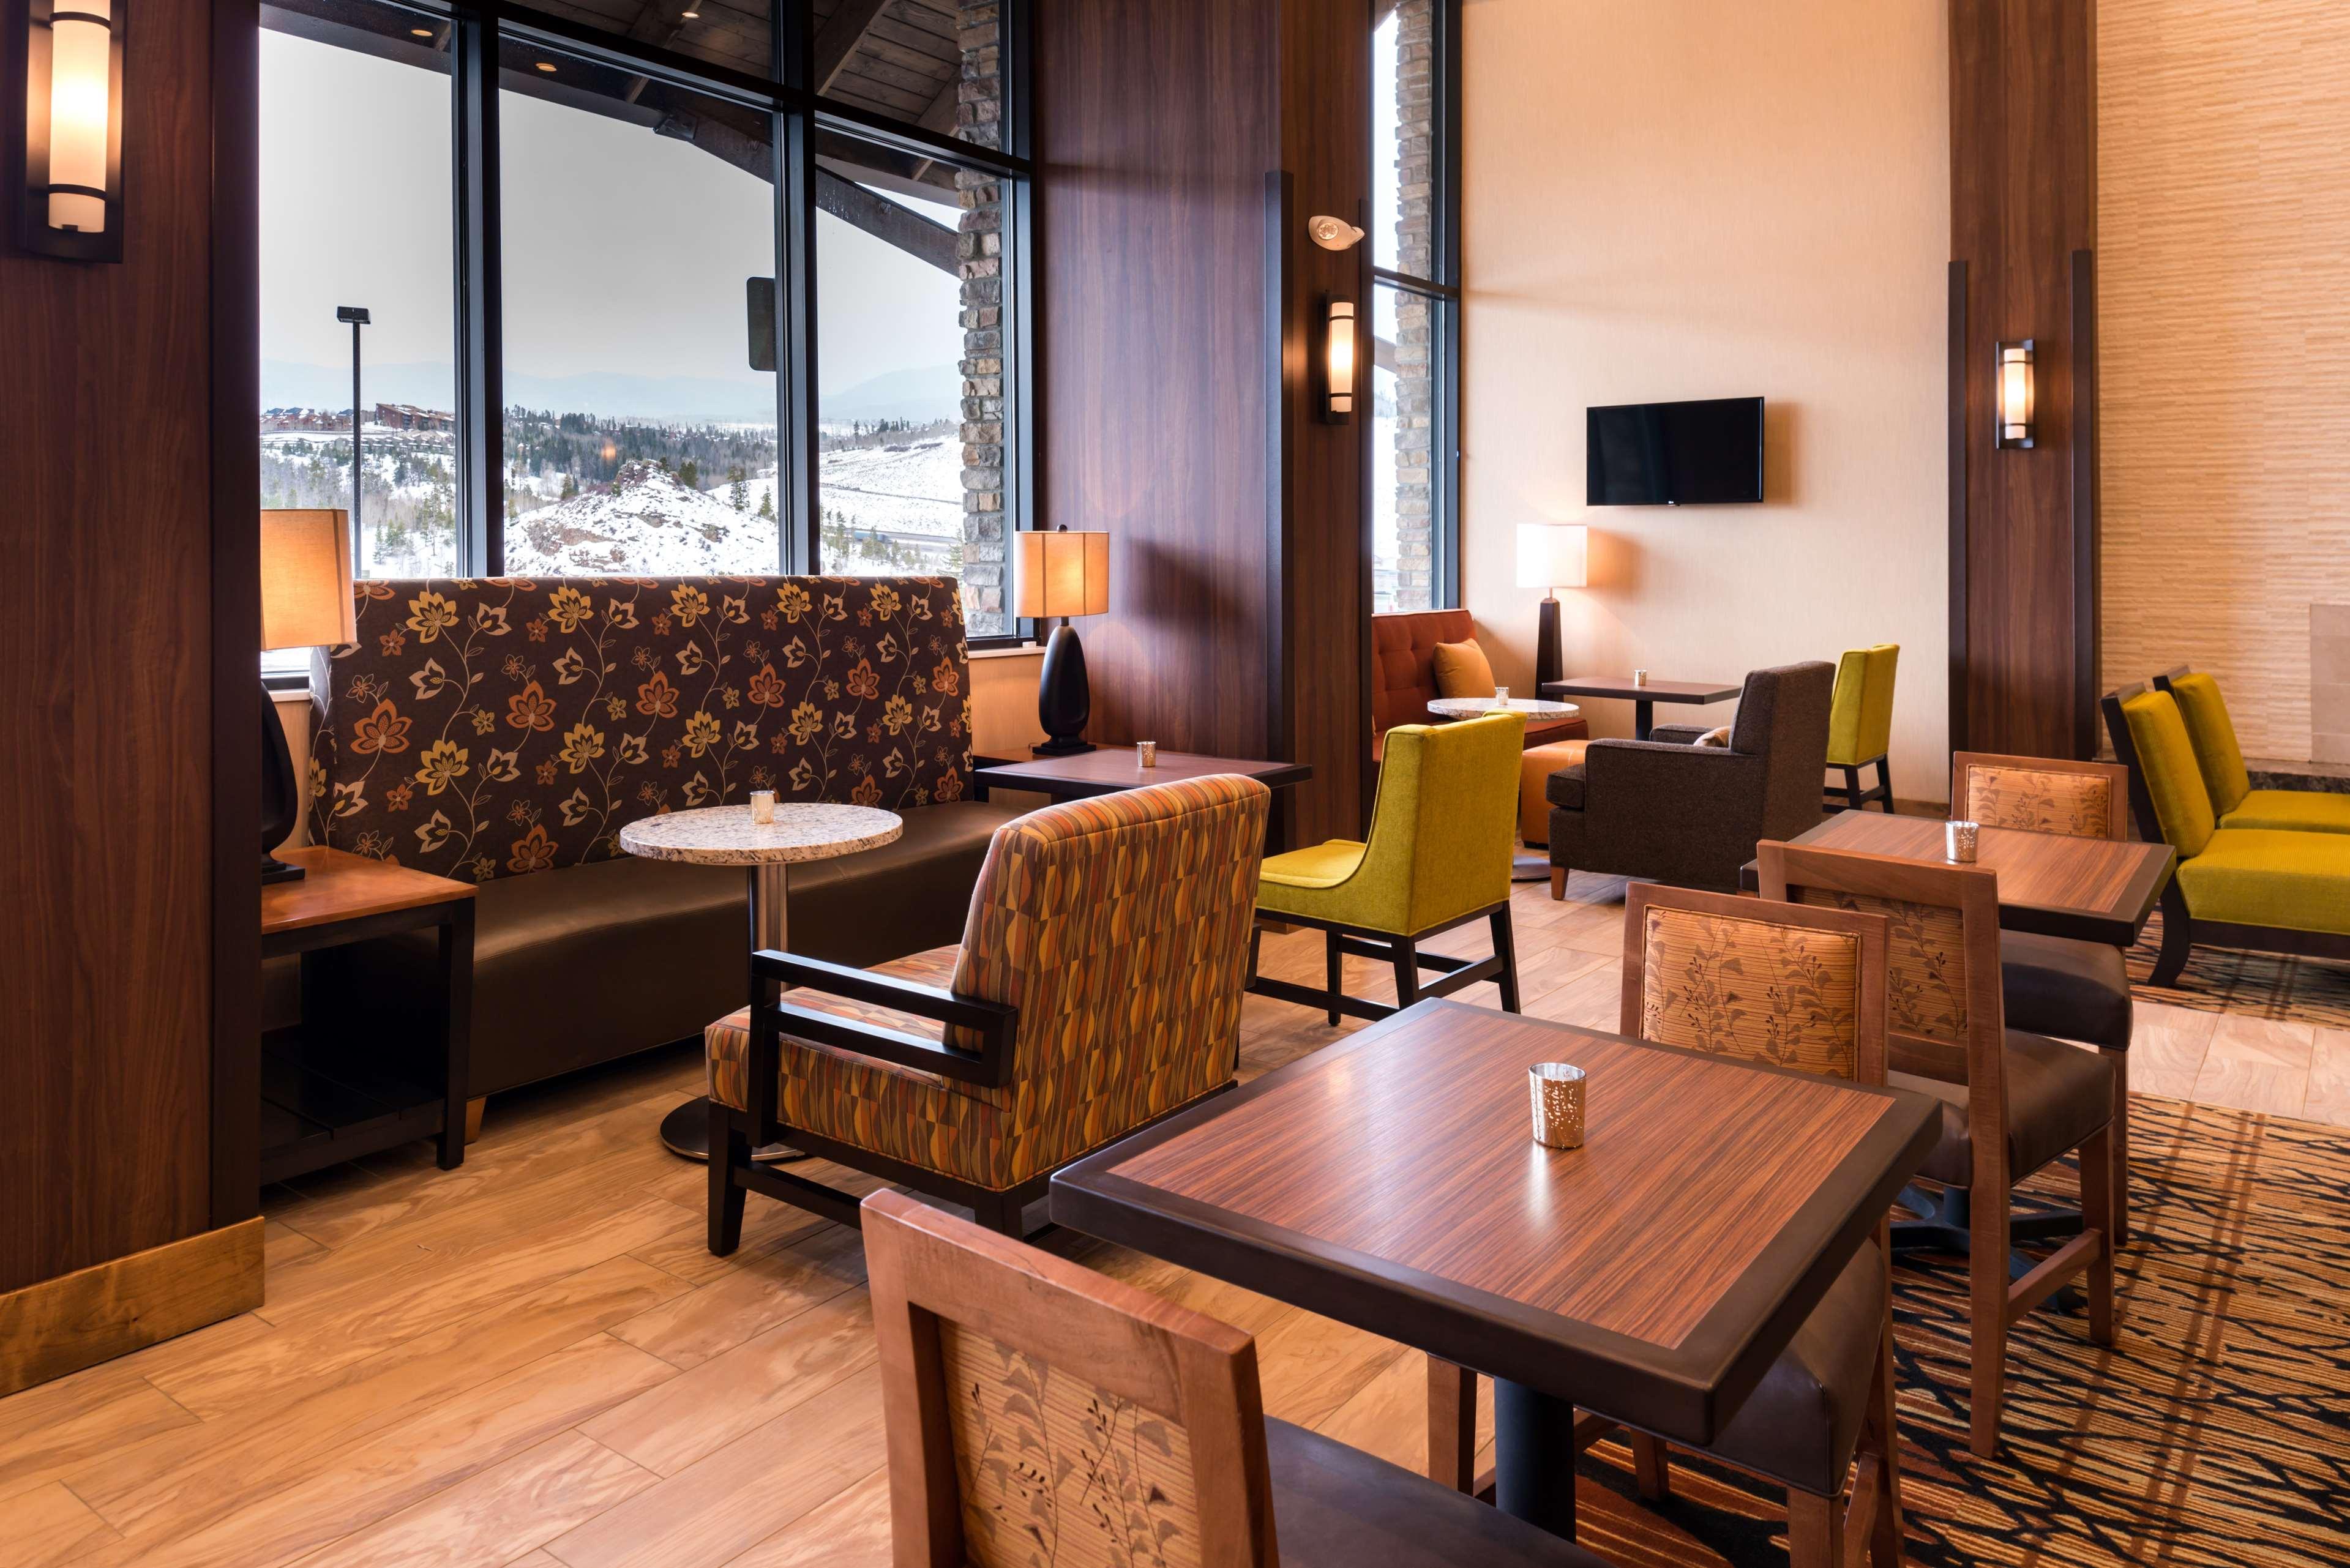 Hampton Inn & Suites Silverthorne image 8